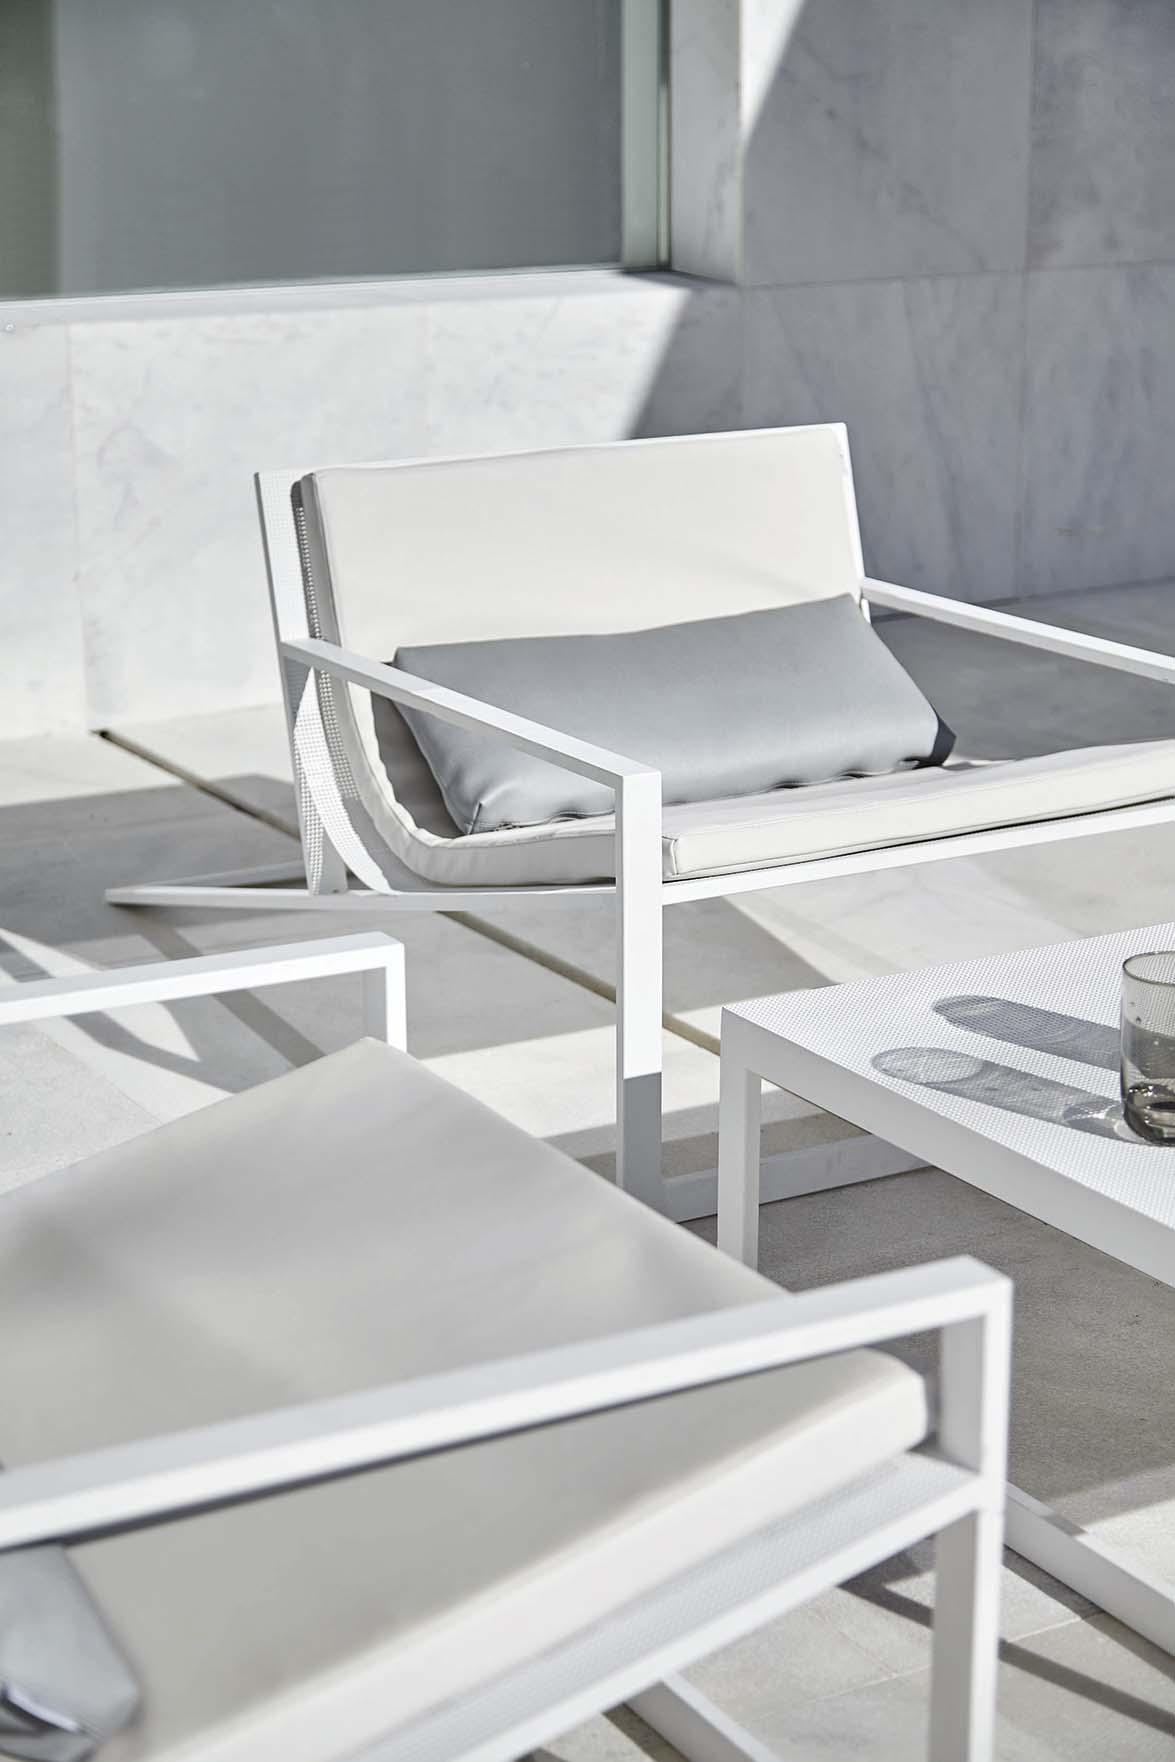 blau by fran silvestre for gandiablasco mediterranean. Black Bedroom Furniture Sets. Home Design Ideas